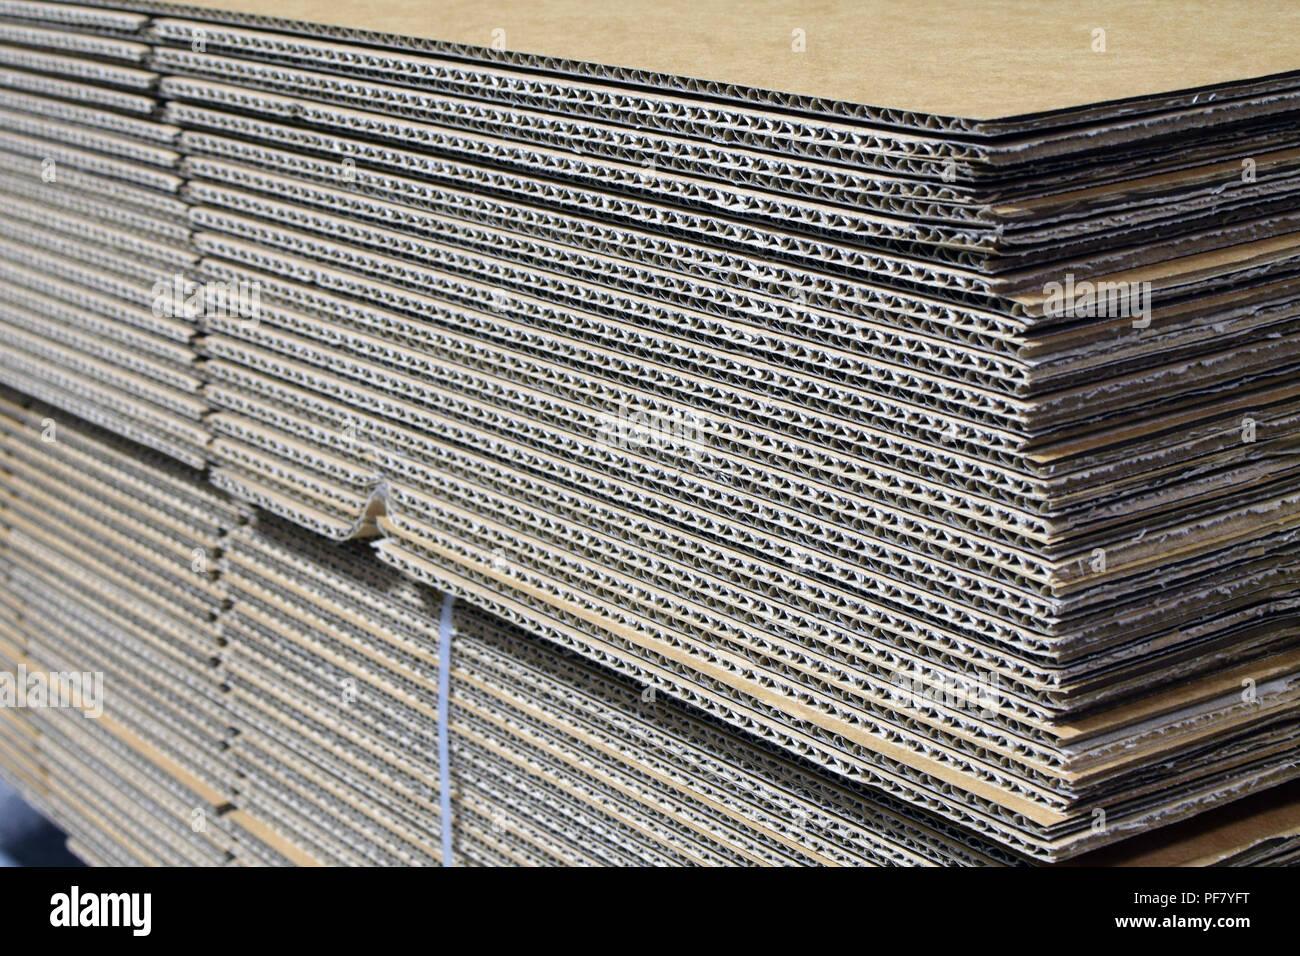 Pile de carton aplati Photo Stock